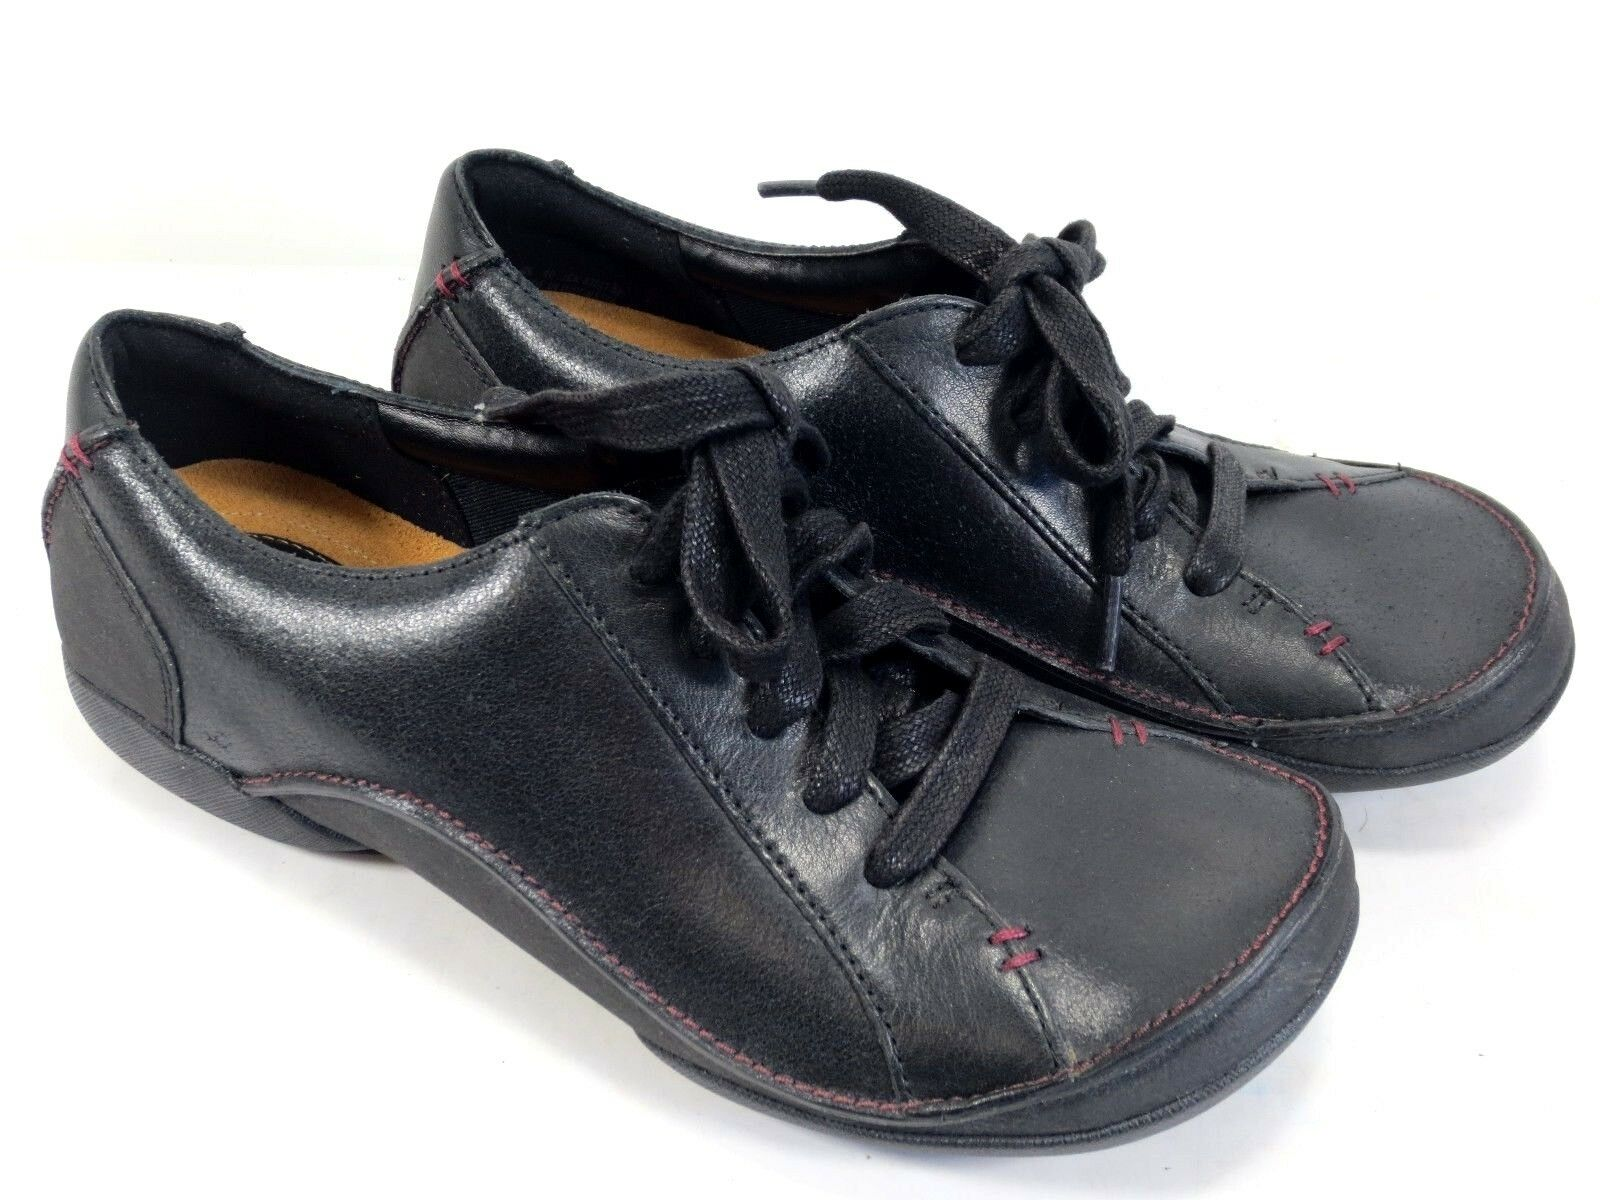 CLARKS Felicia Alice weiche Leder Schuhe Turnschuhe Halbschuhe Komfort NEU 99,95